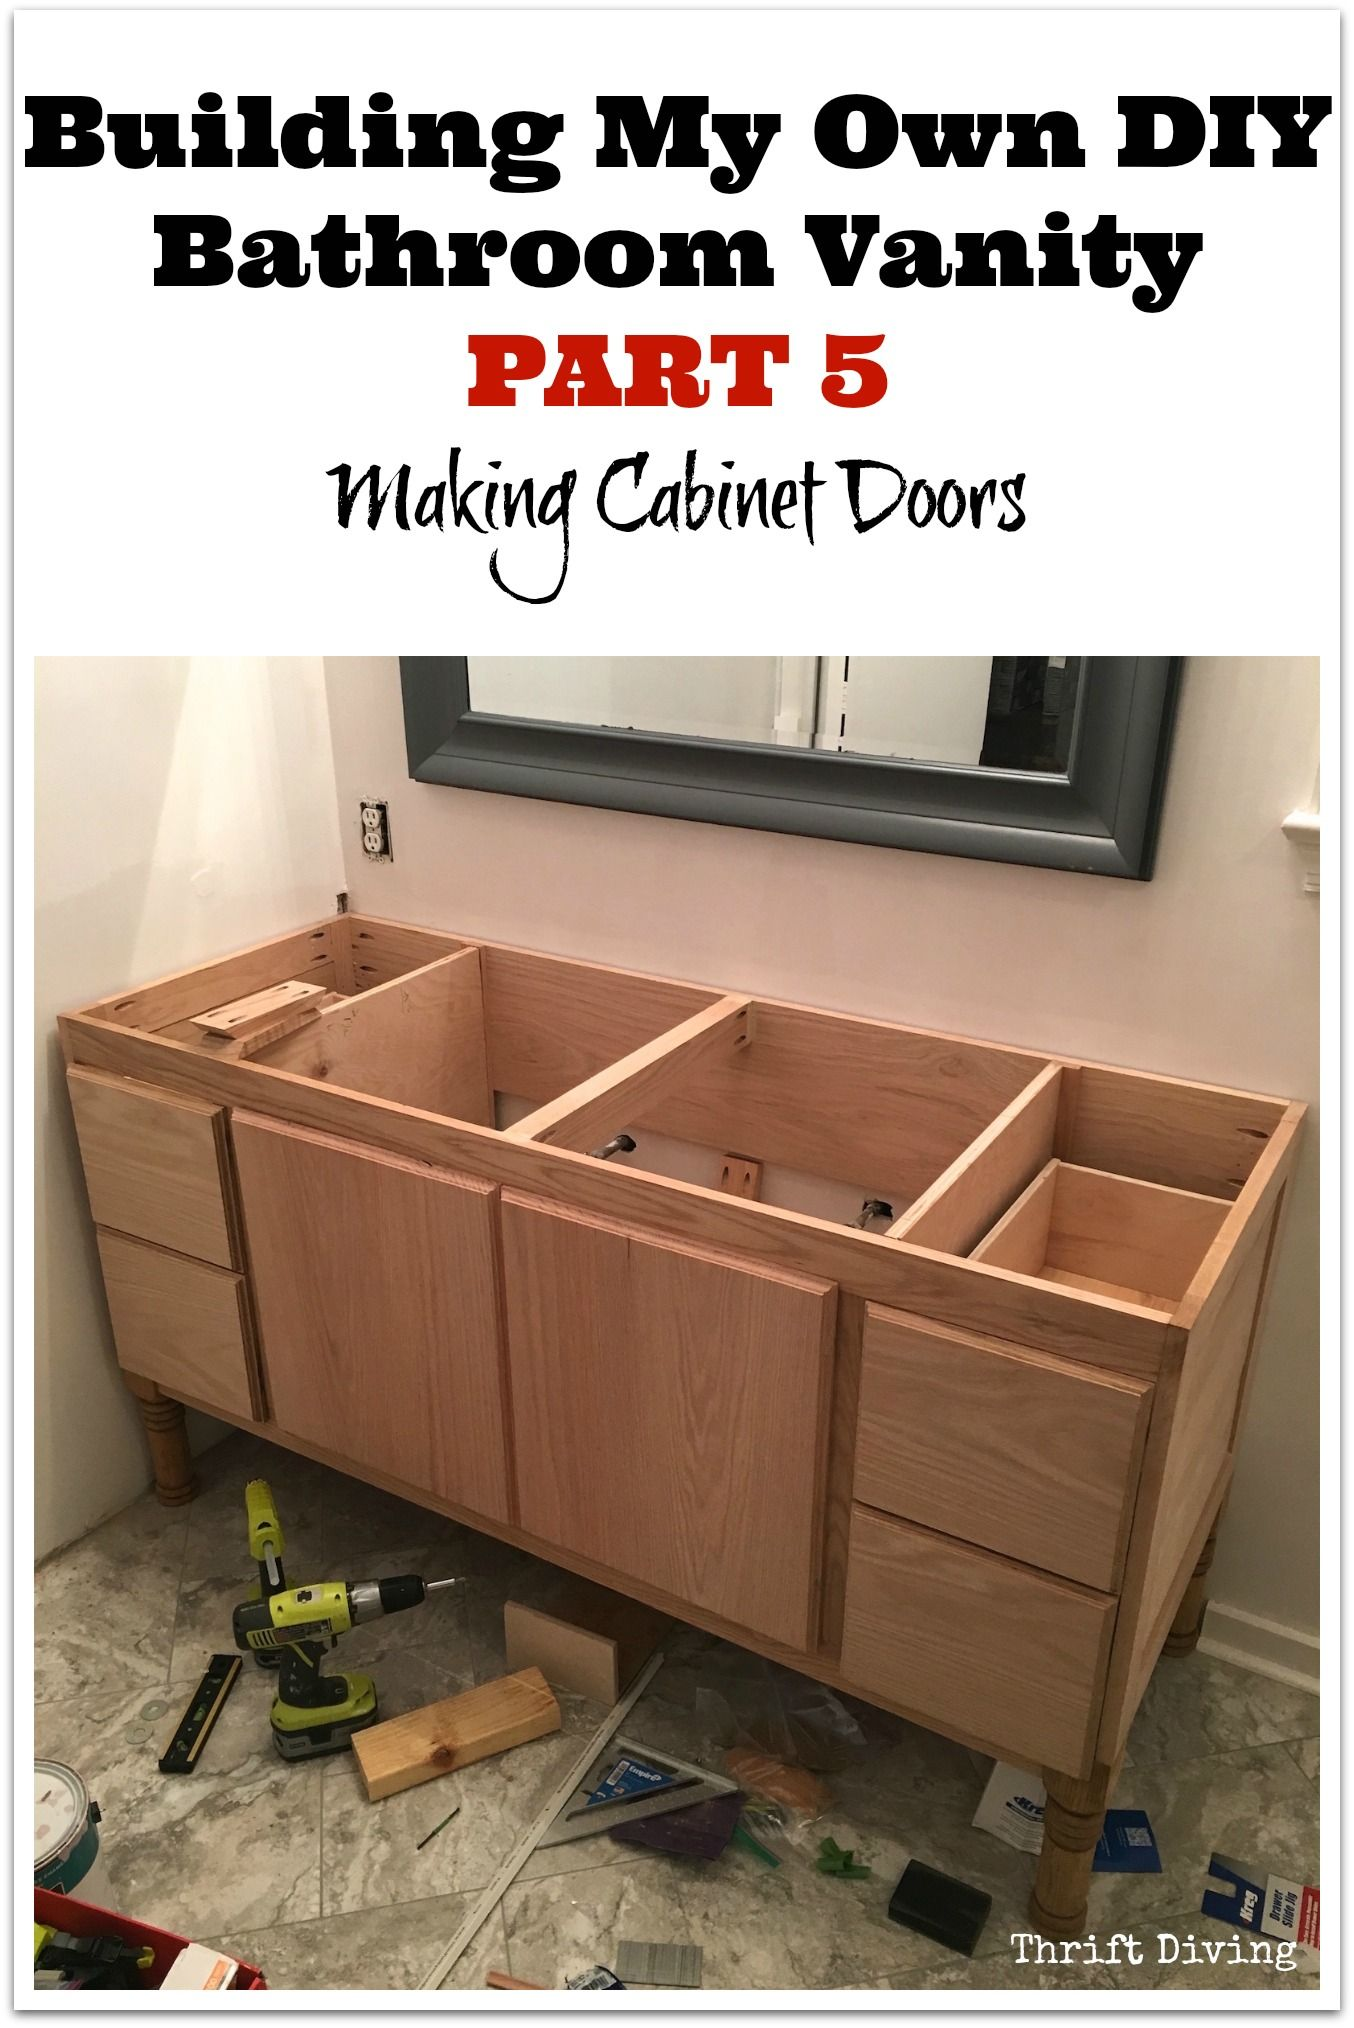 Build A Diy Bathroom Vanity Part 5 Making Cabinet